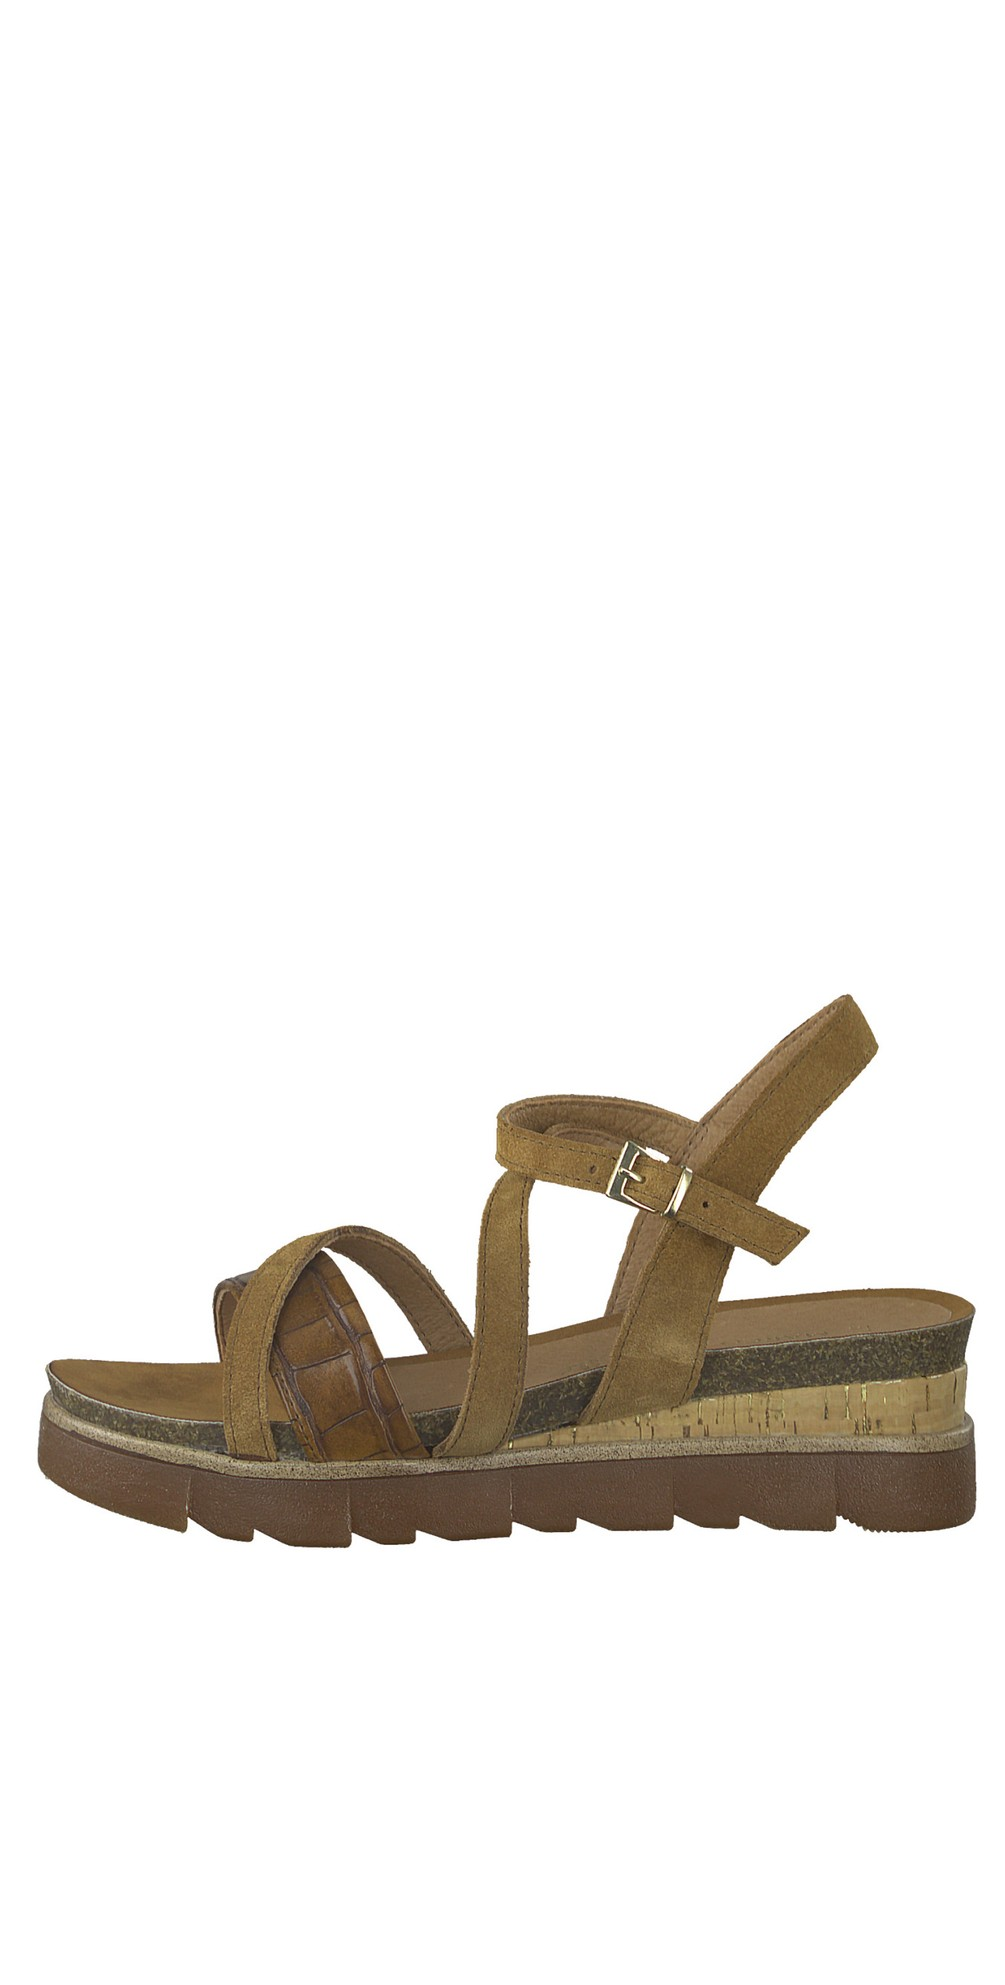 Elvo Wedge Sandal main image